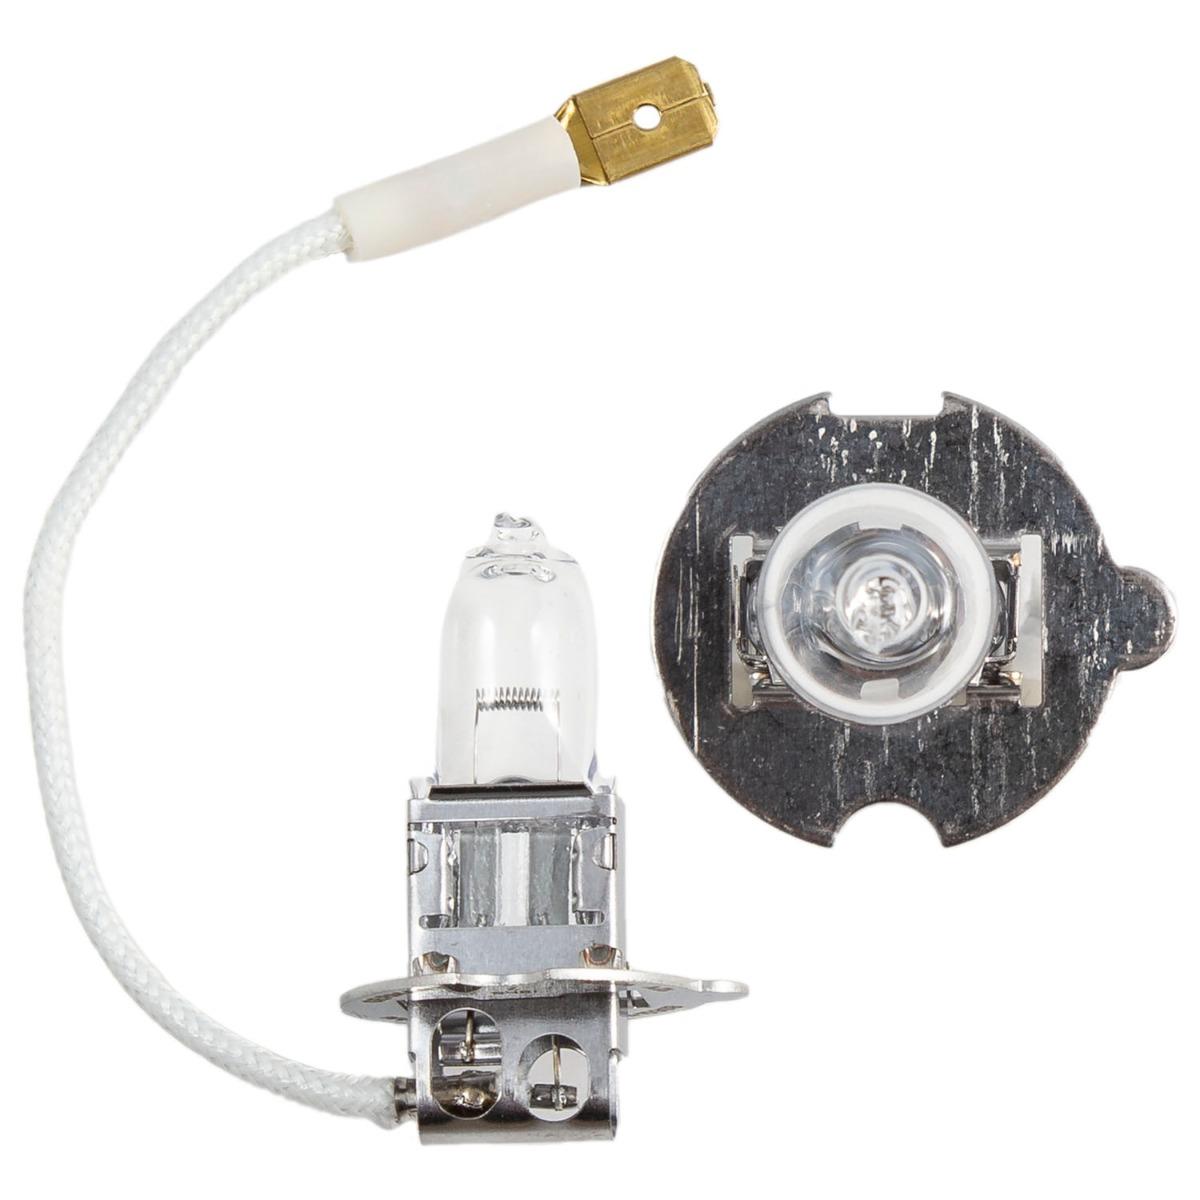 H3 stock bulb